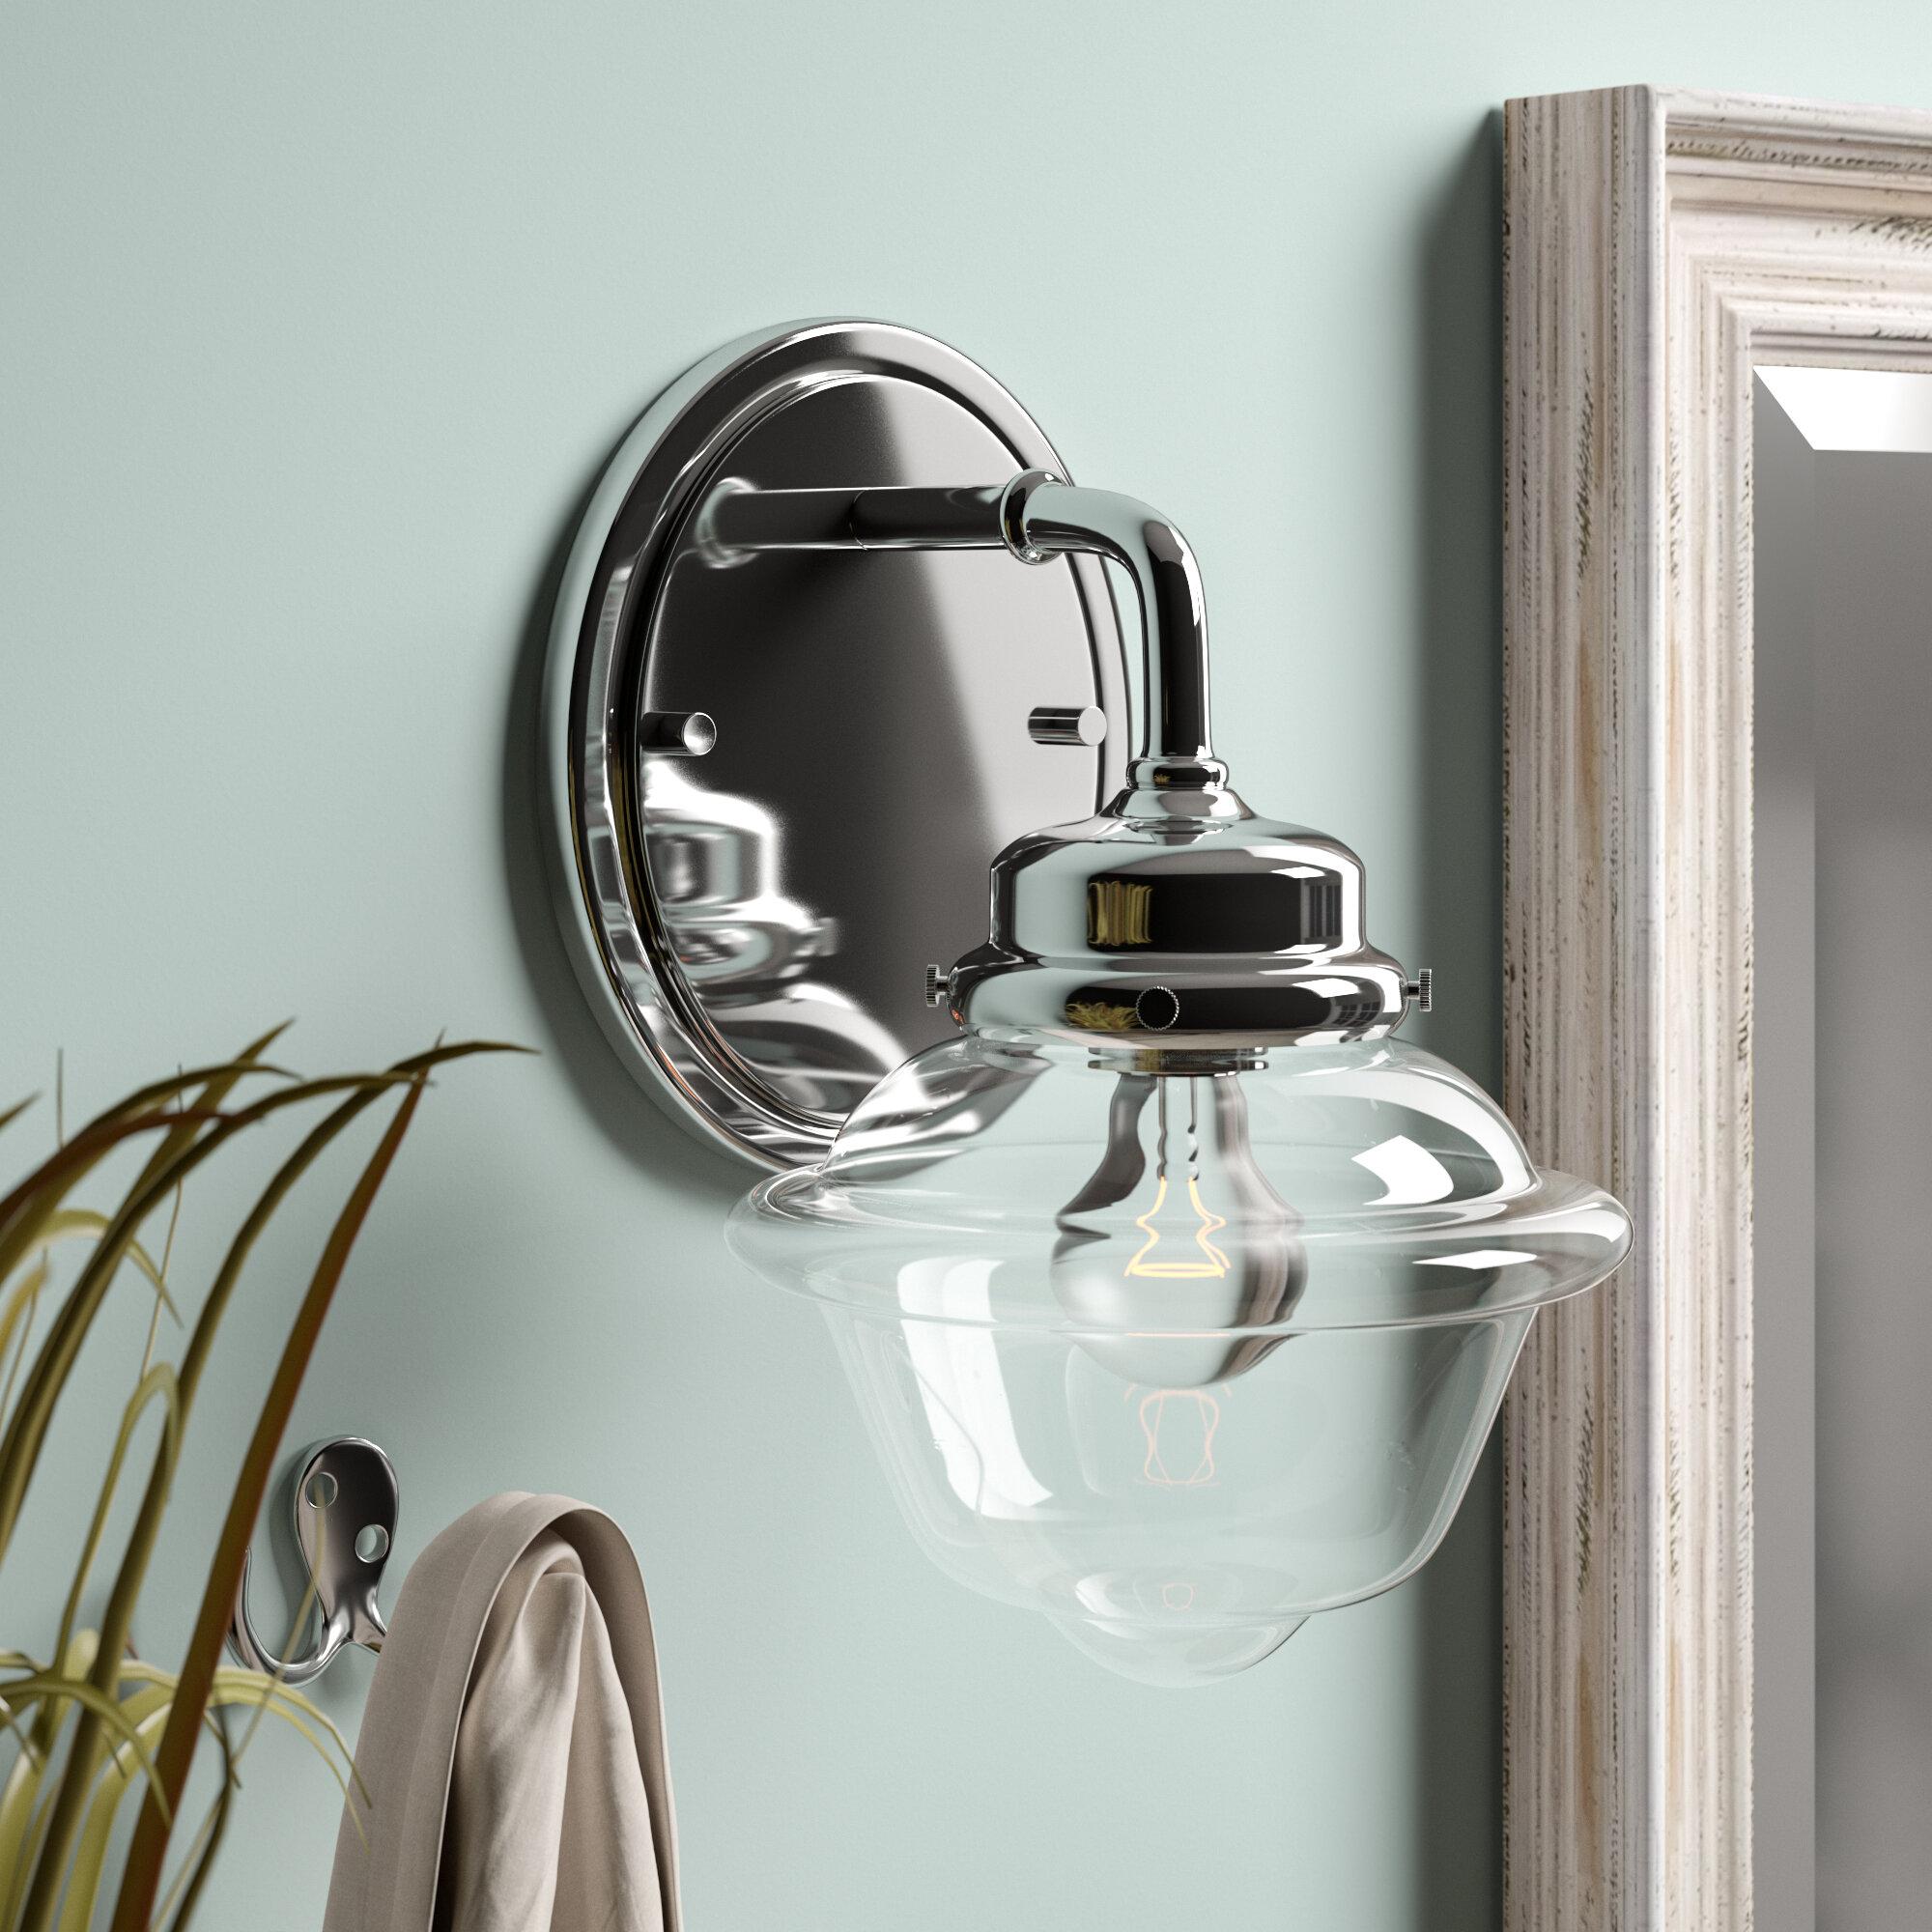 Bathroom Sconce Traditional Bathroom Vanity Lighting You Ll Love In 2021 Wayfair